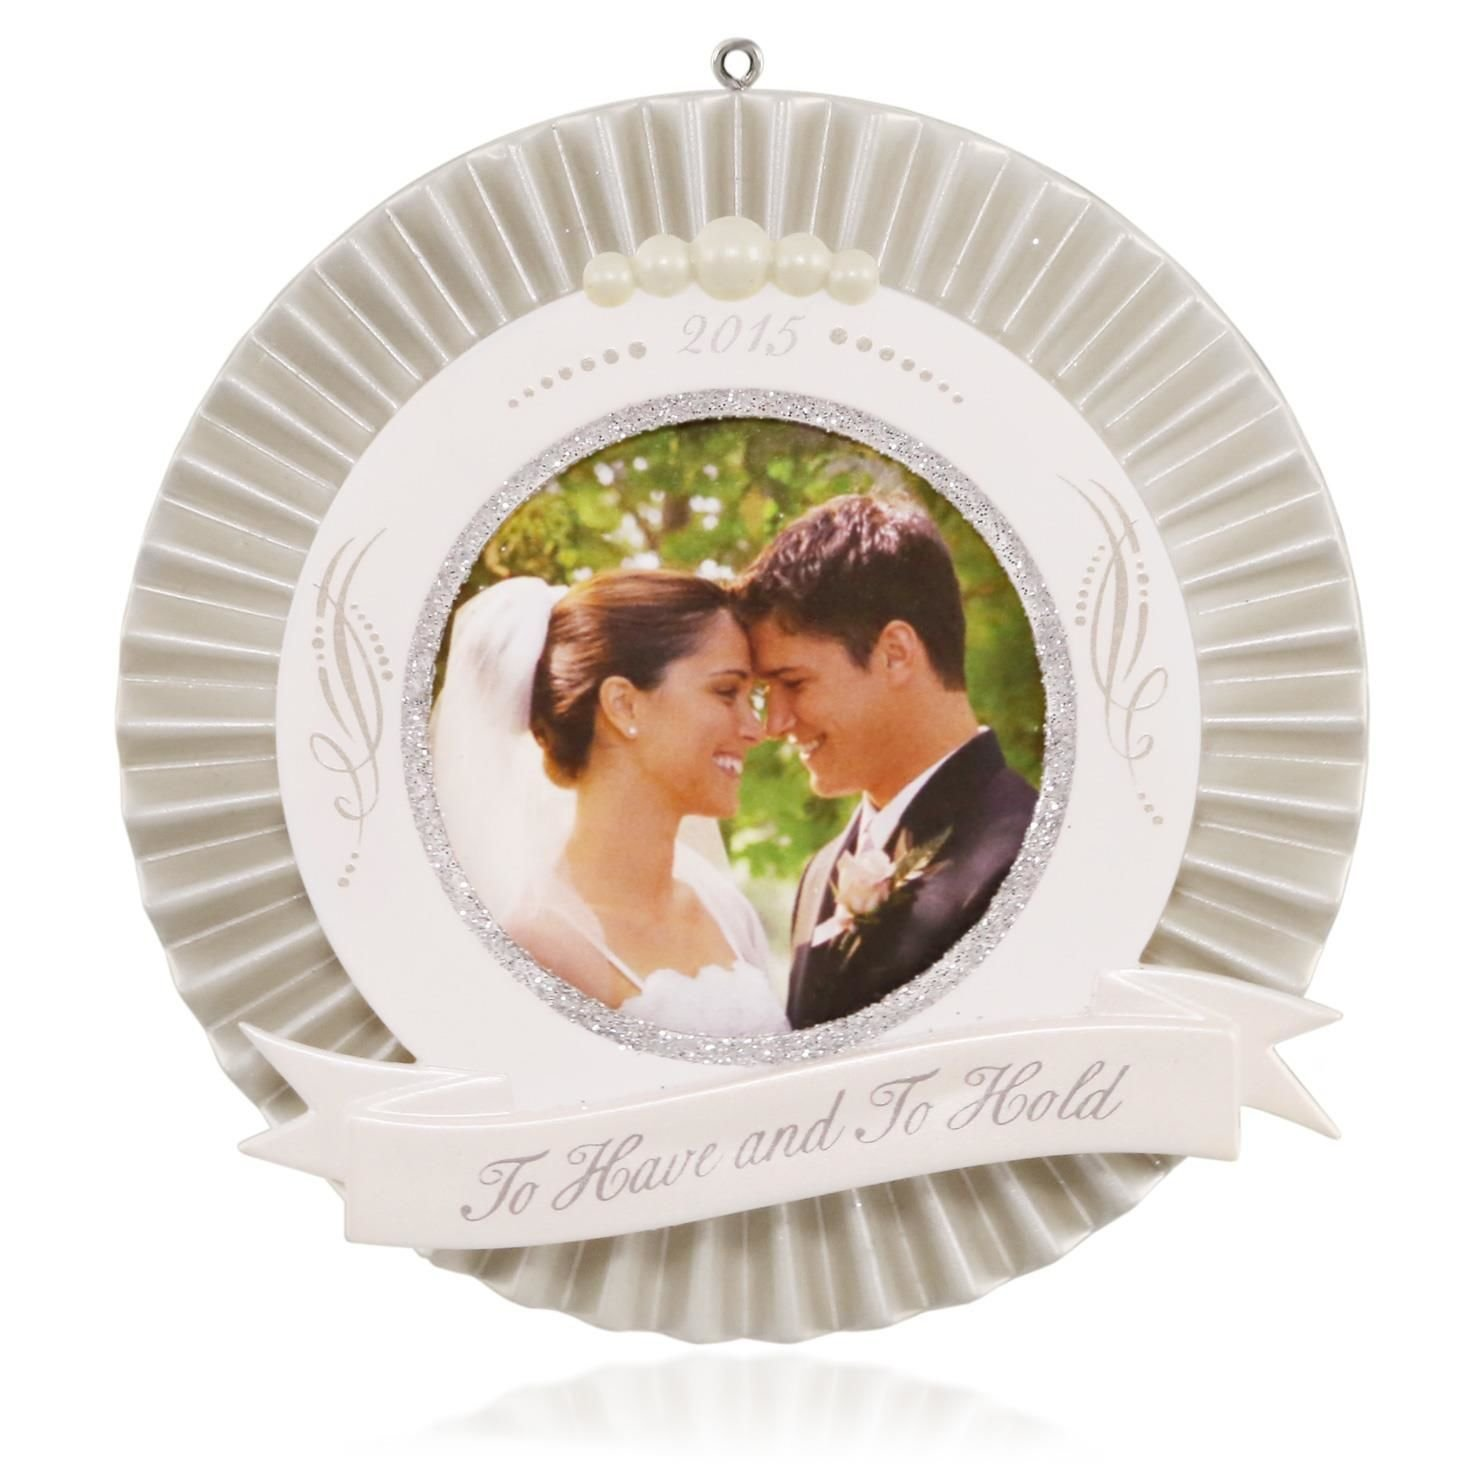 Hallmark Keepsake  Our Wedding  2015